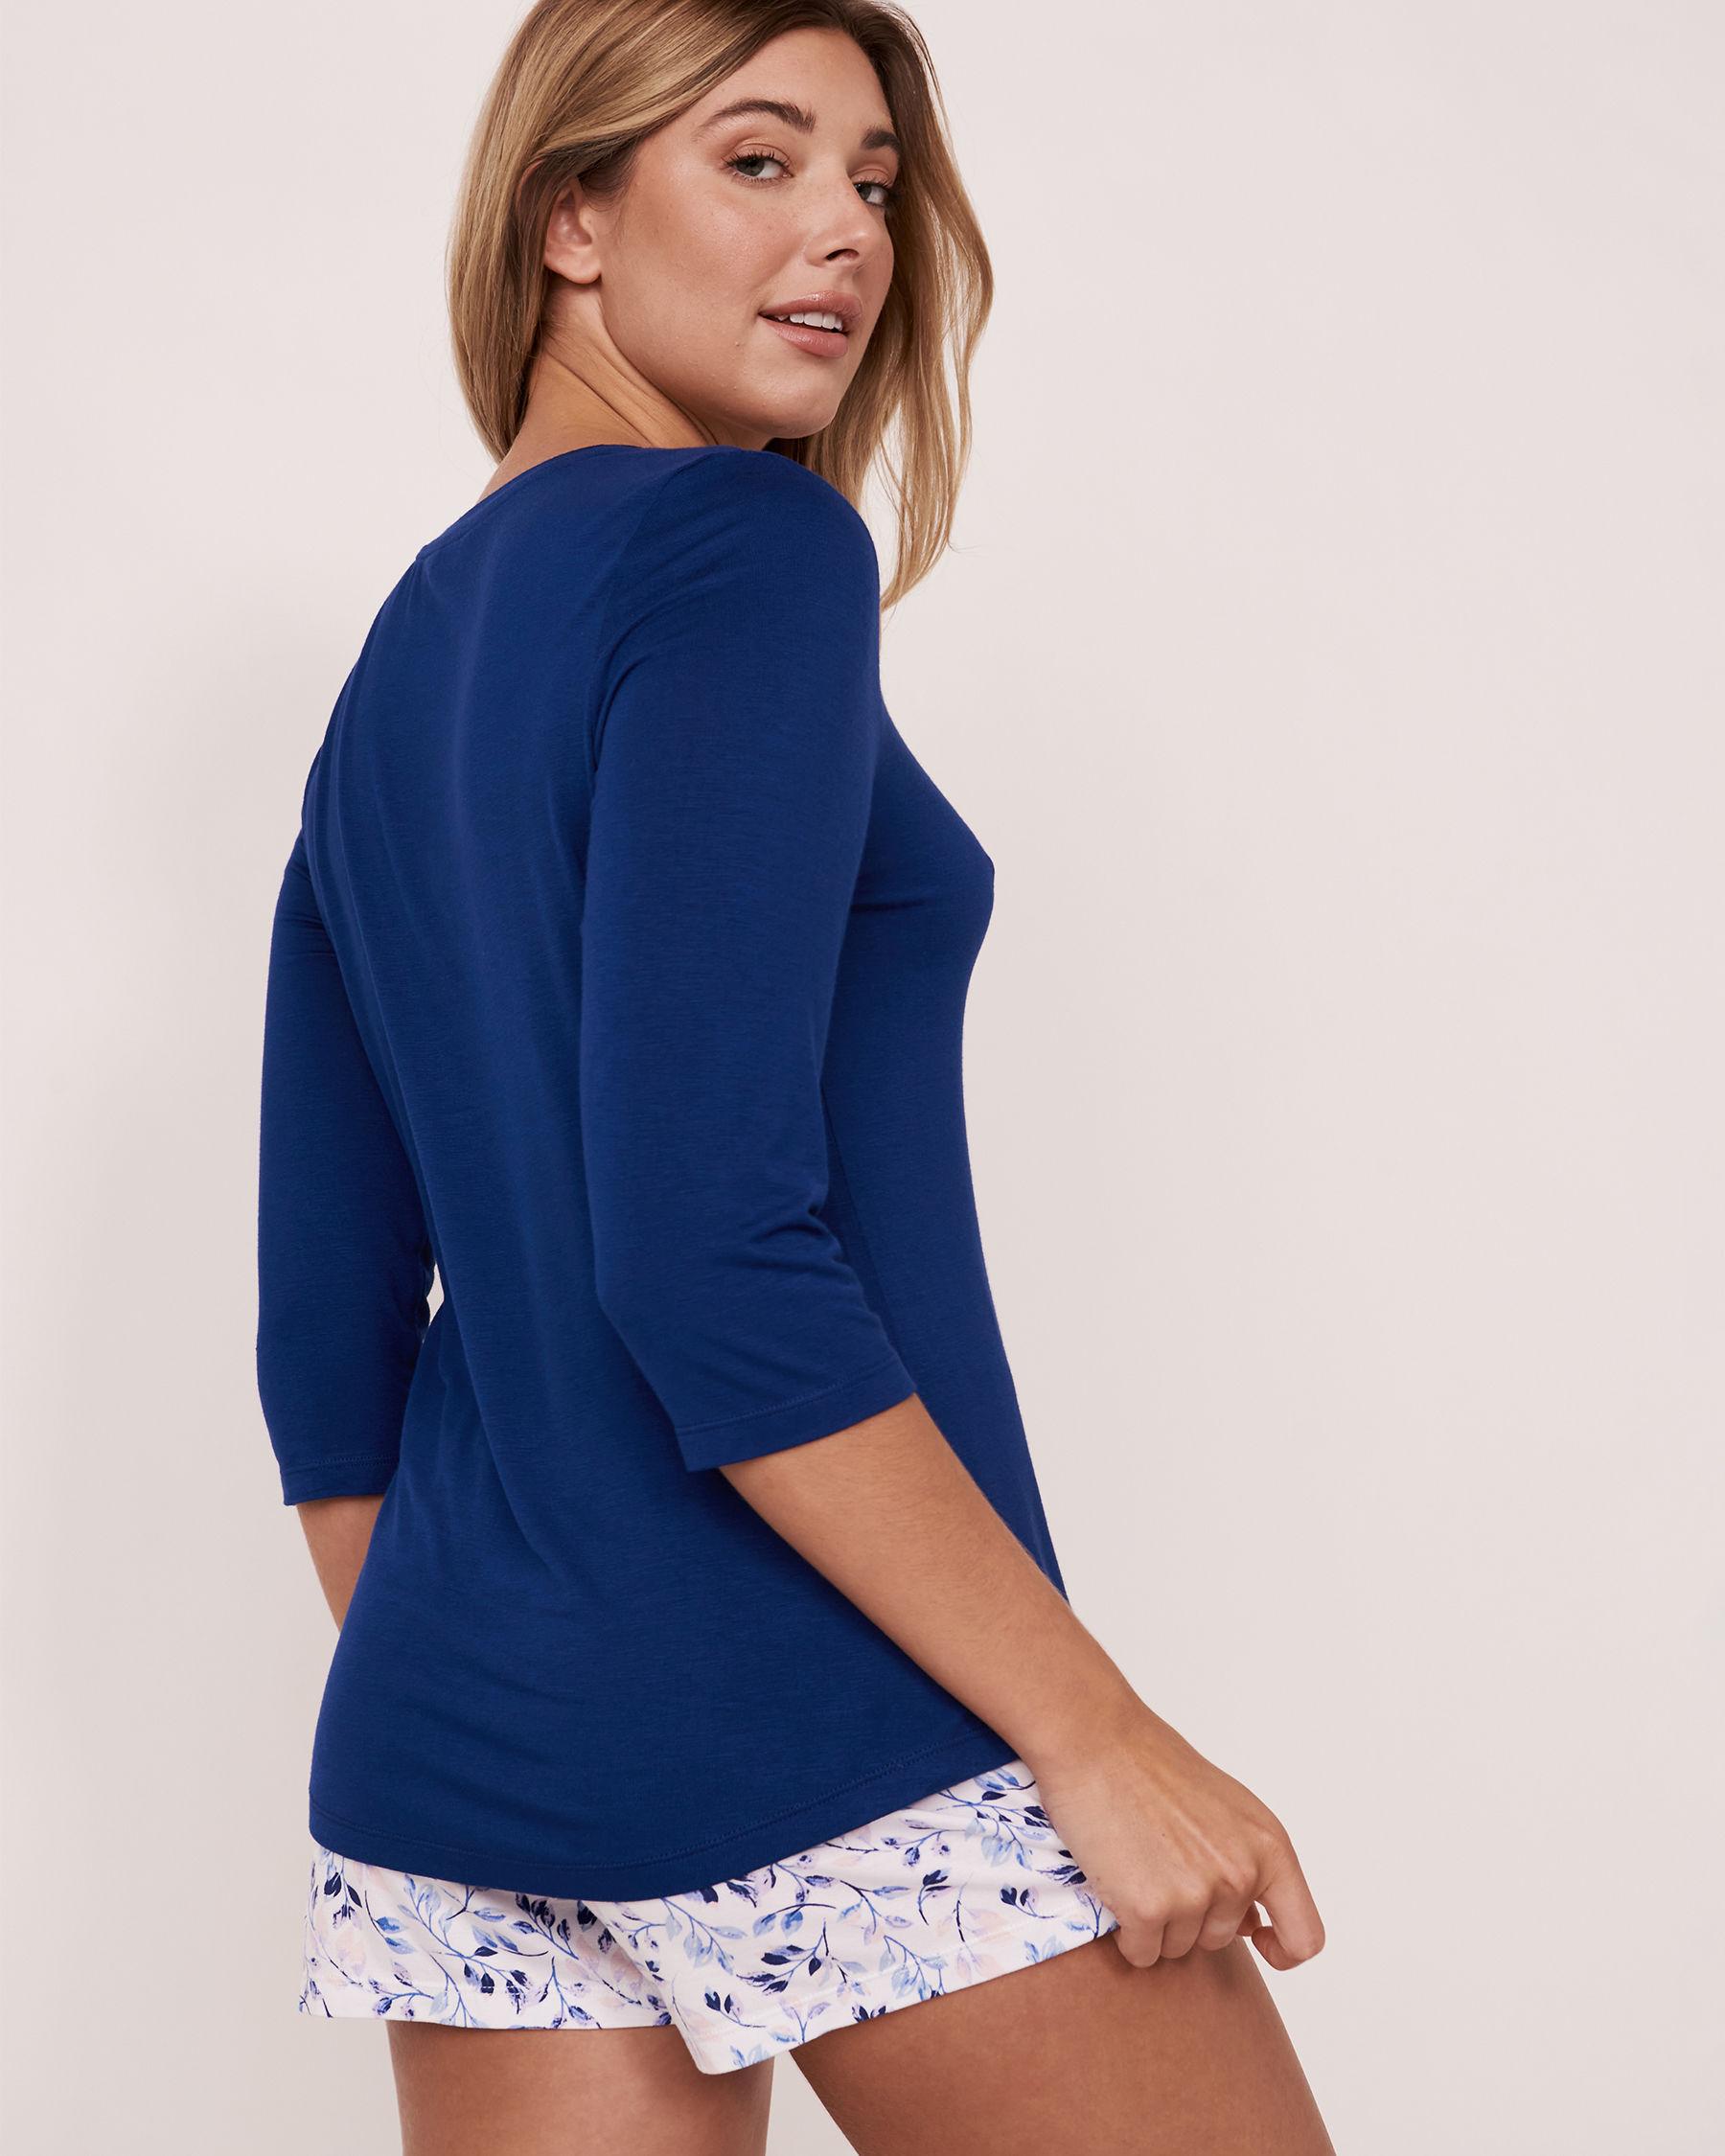 LA VIE EN ROSE V-neck 3/4 Sleeve Shirt Blue 40100072 - View2